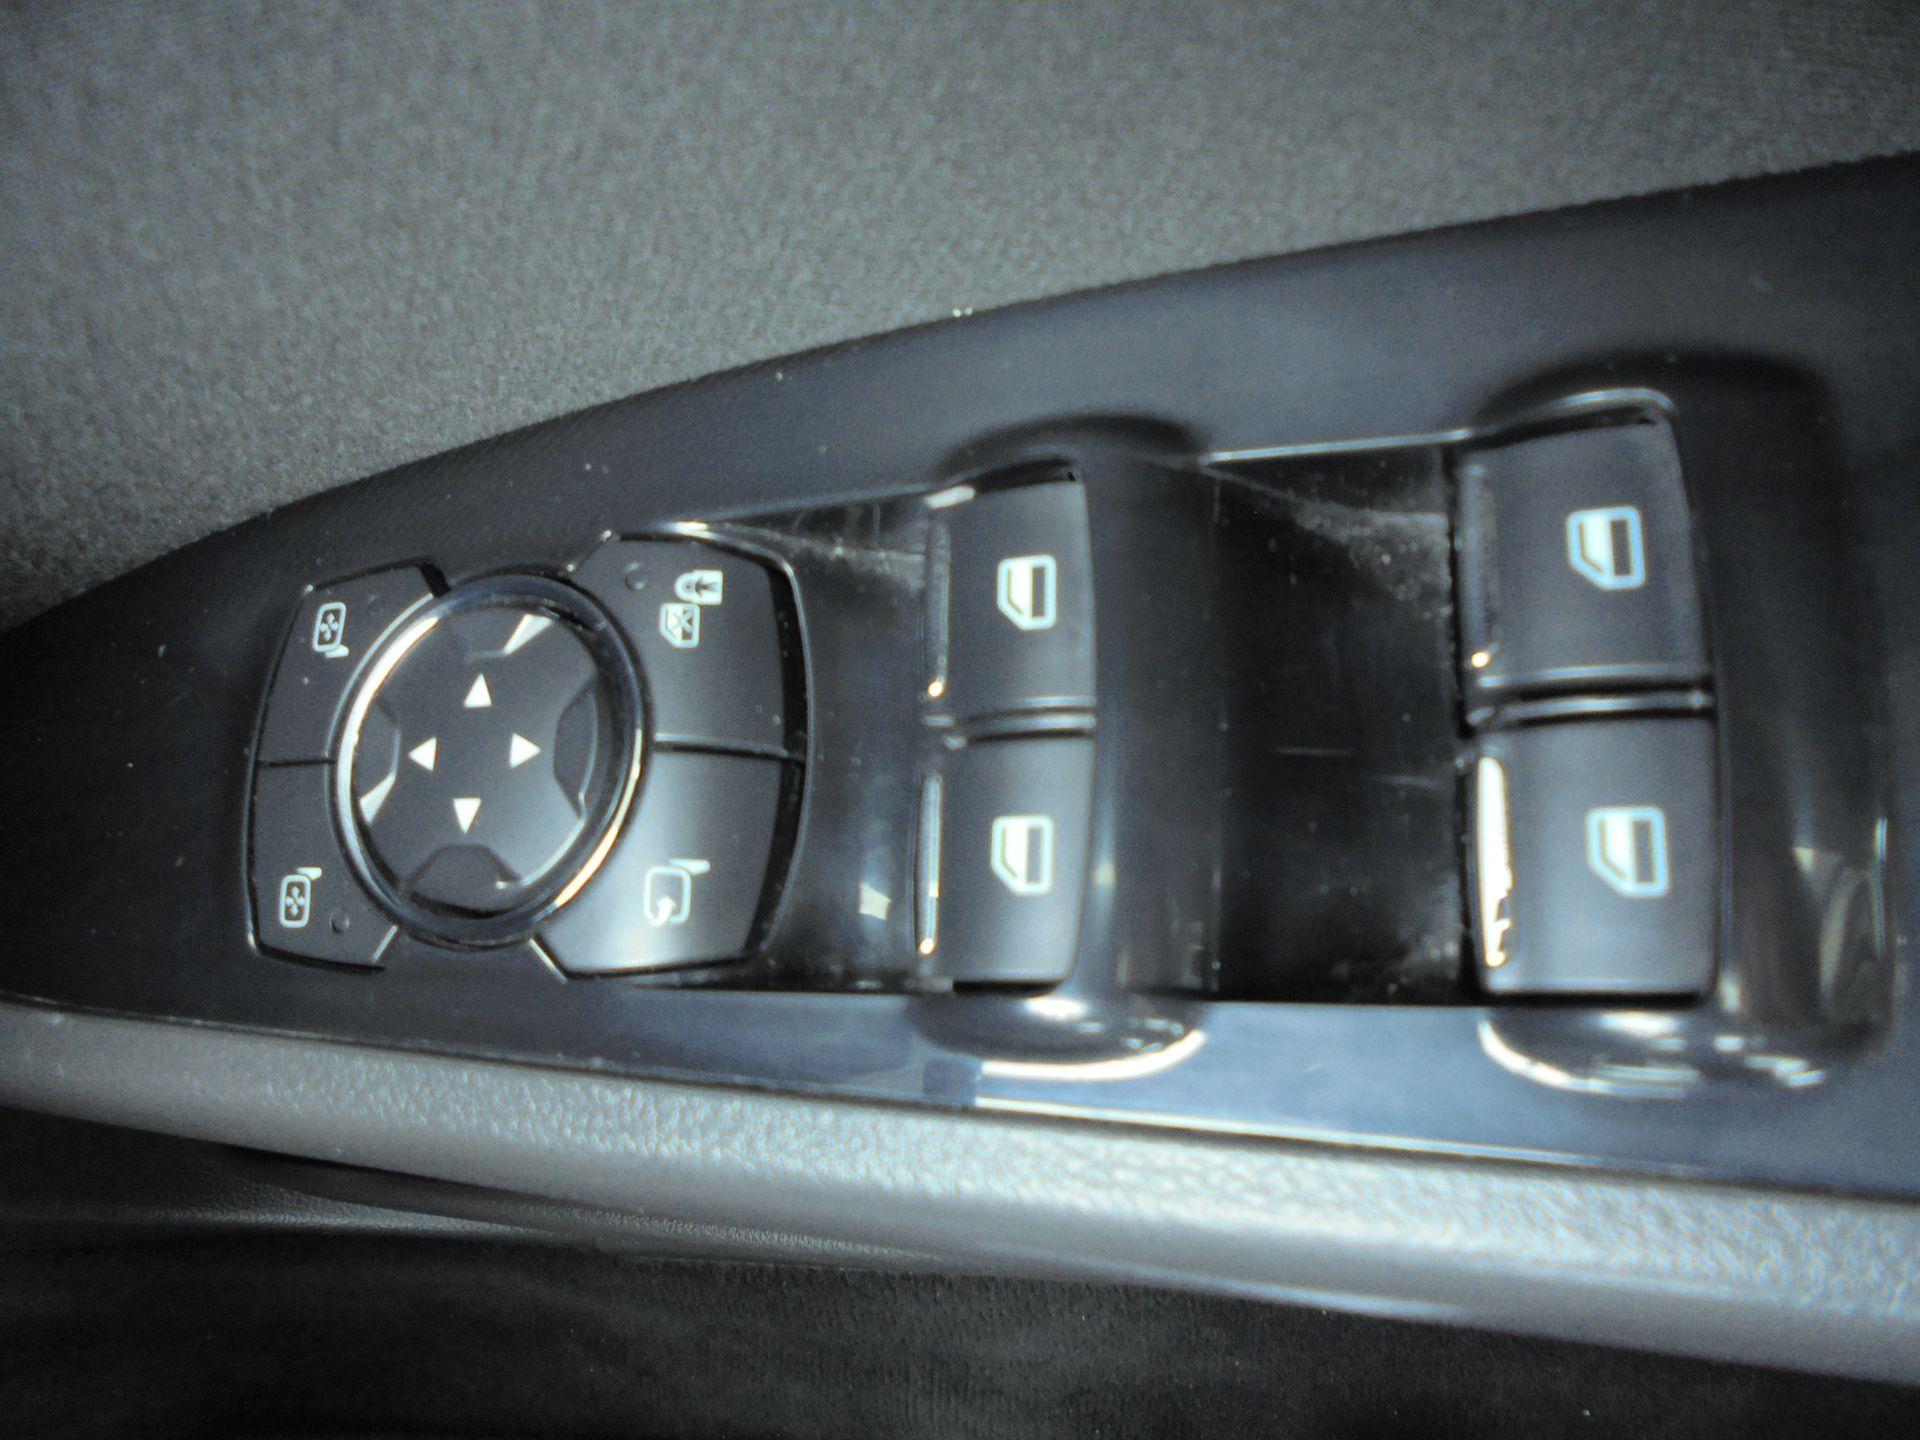 2017 Ford Mondeo 2.0 Tdci Econetic Zetec 5Dr [Nav] (WM17RHO) Image 18